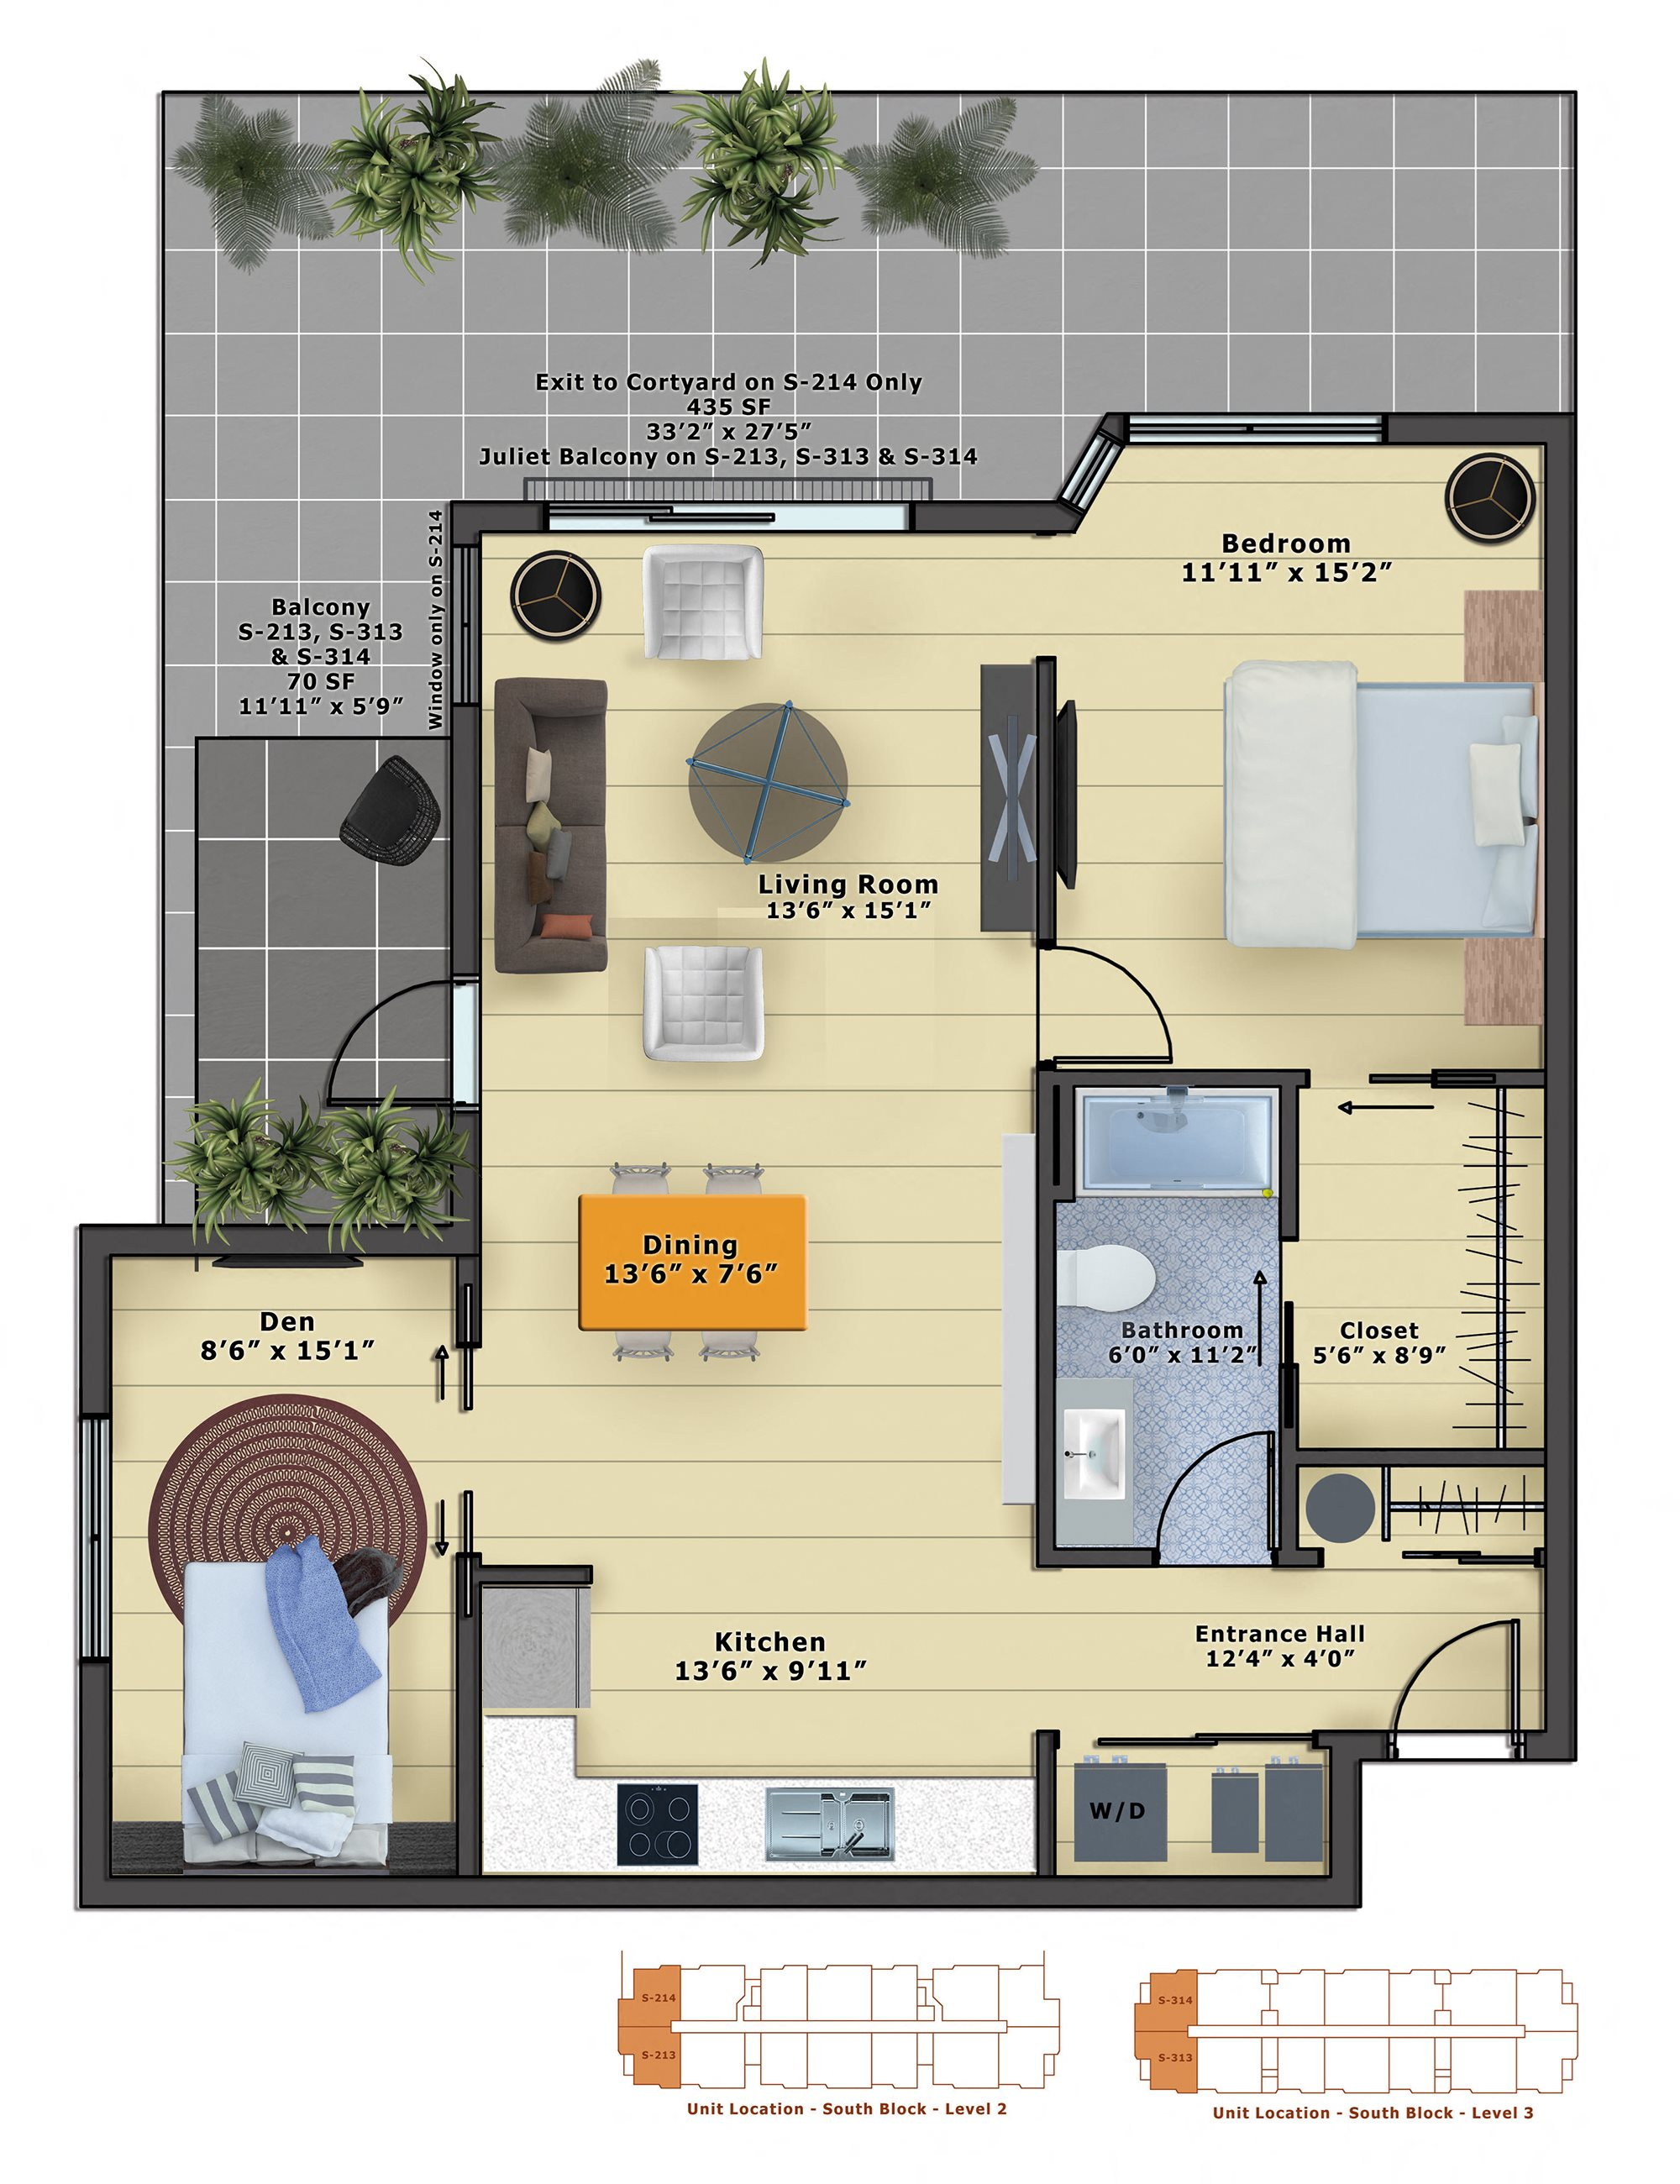 Opal (1b/1b w/Den) Floor Plan 15